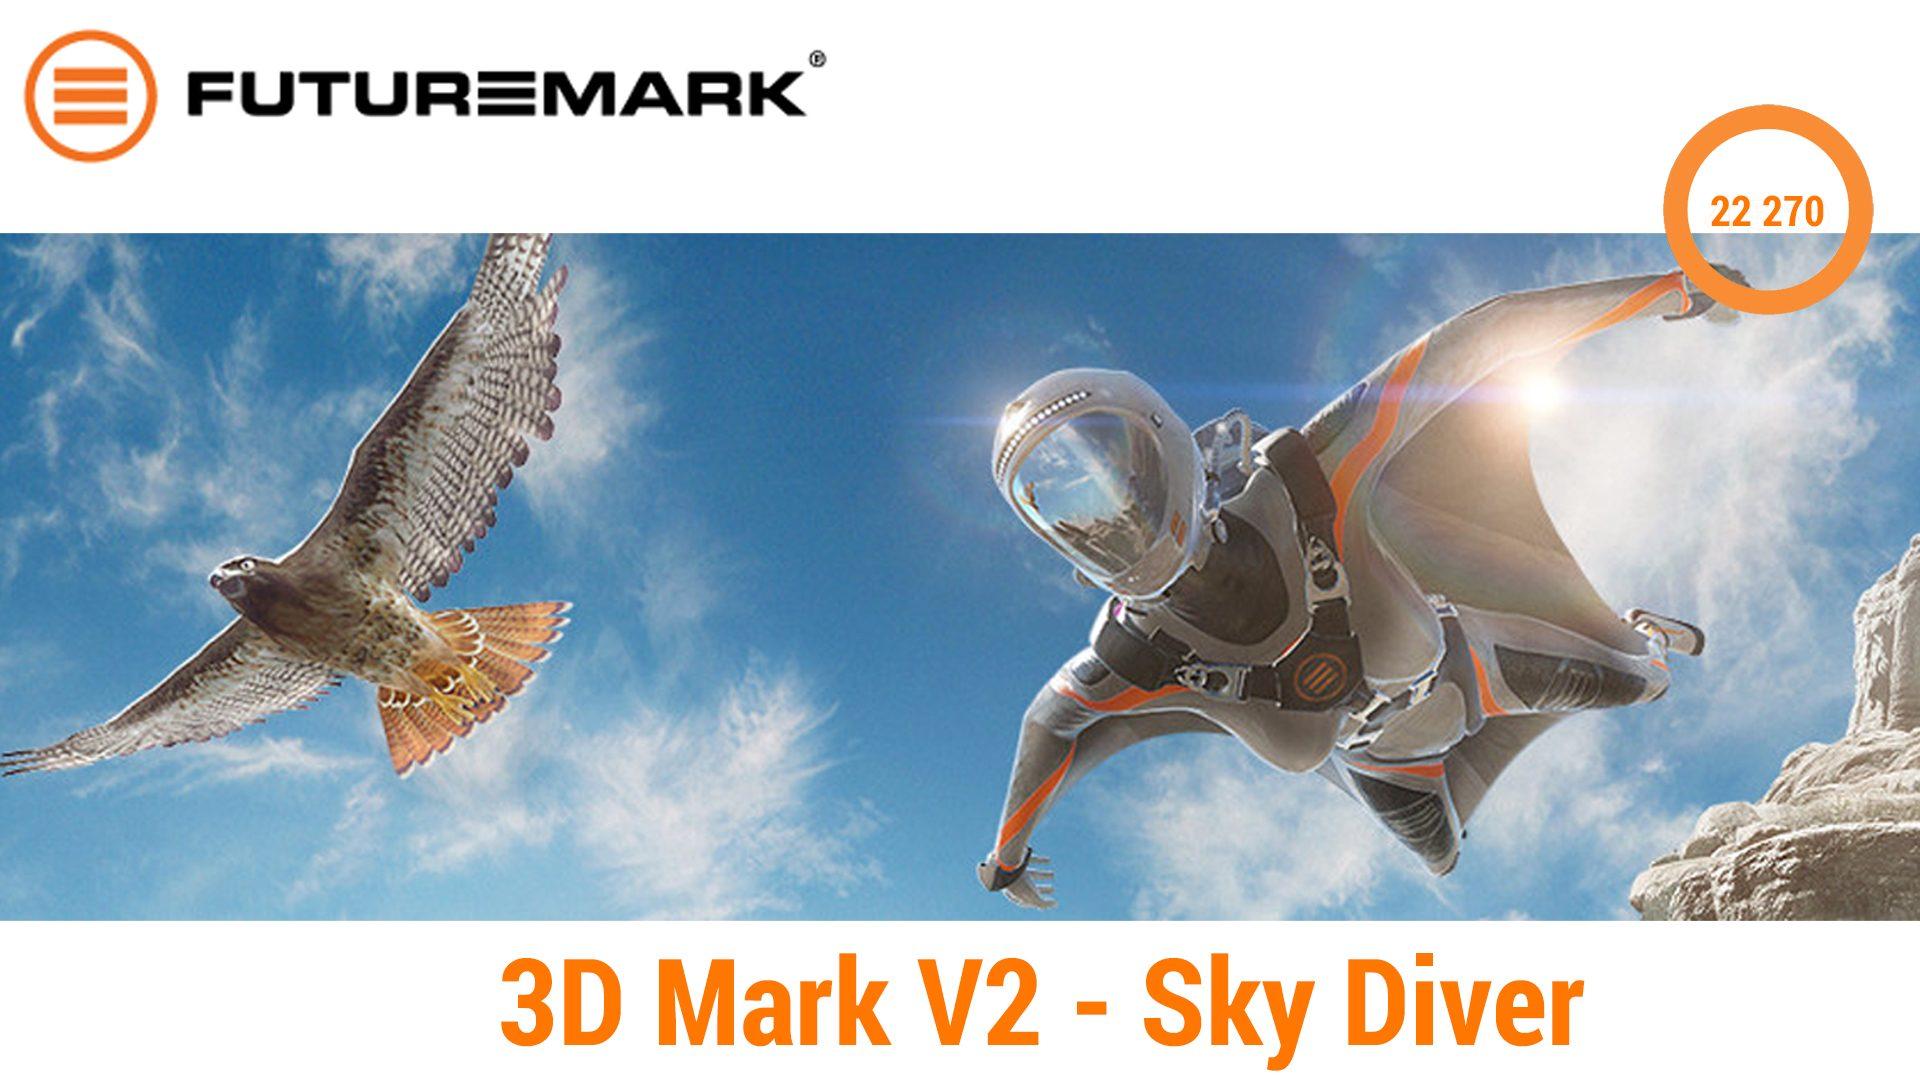 3D Mark V2 – Sky Diver